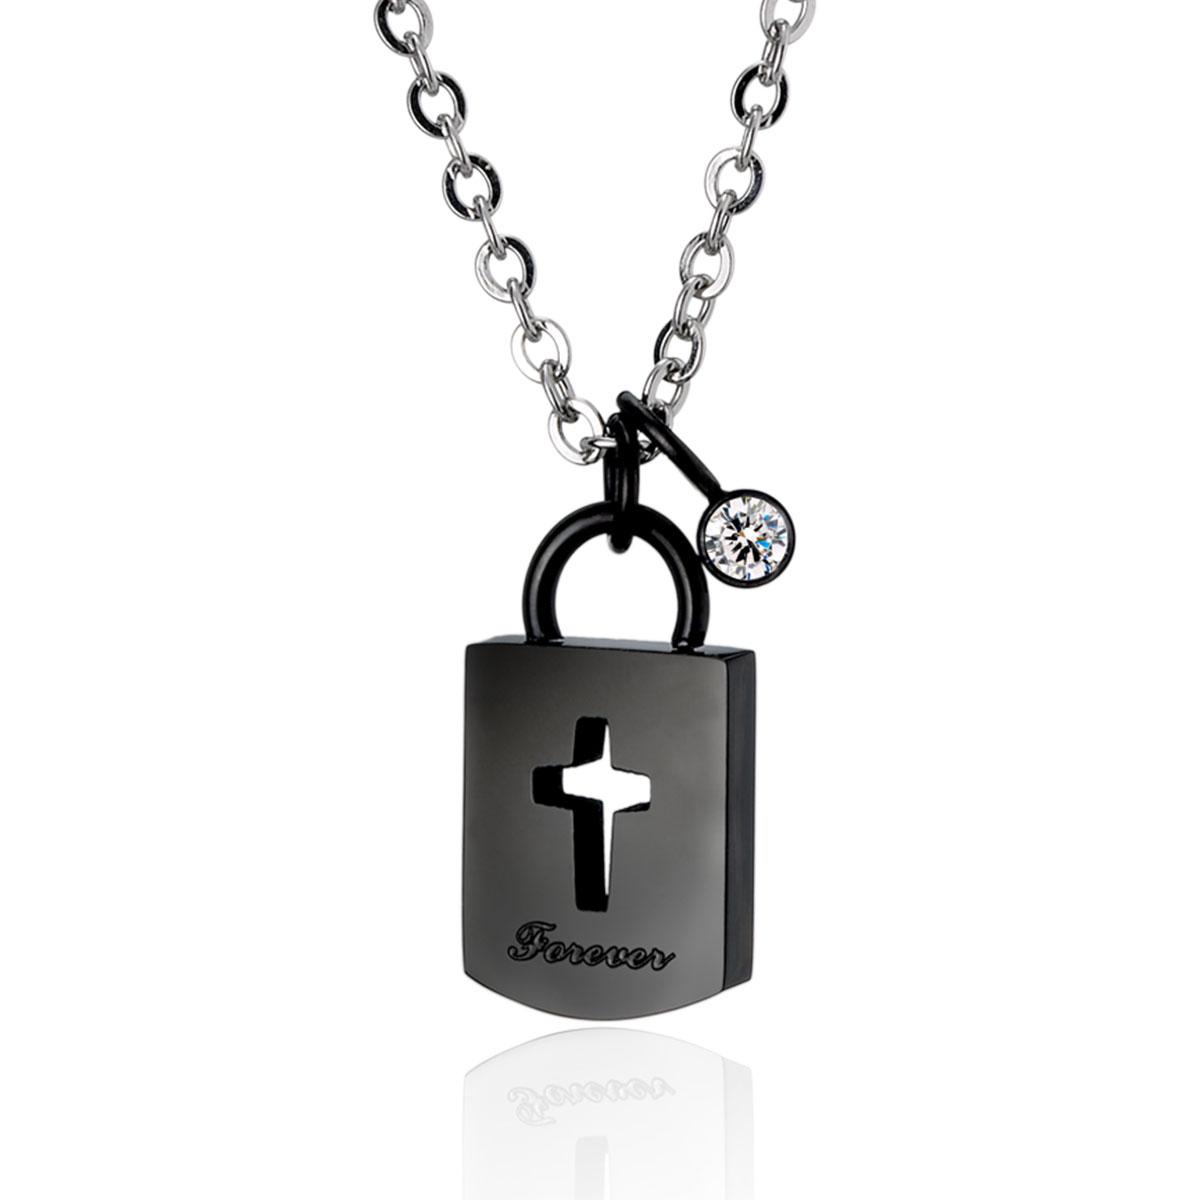 AIM398 永恆愛戀鑰匙組合項鍊